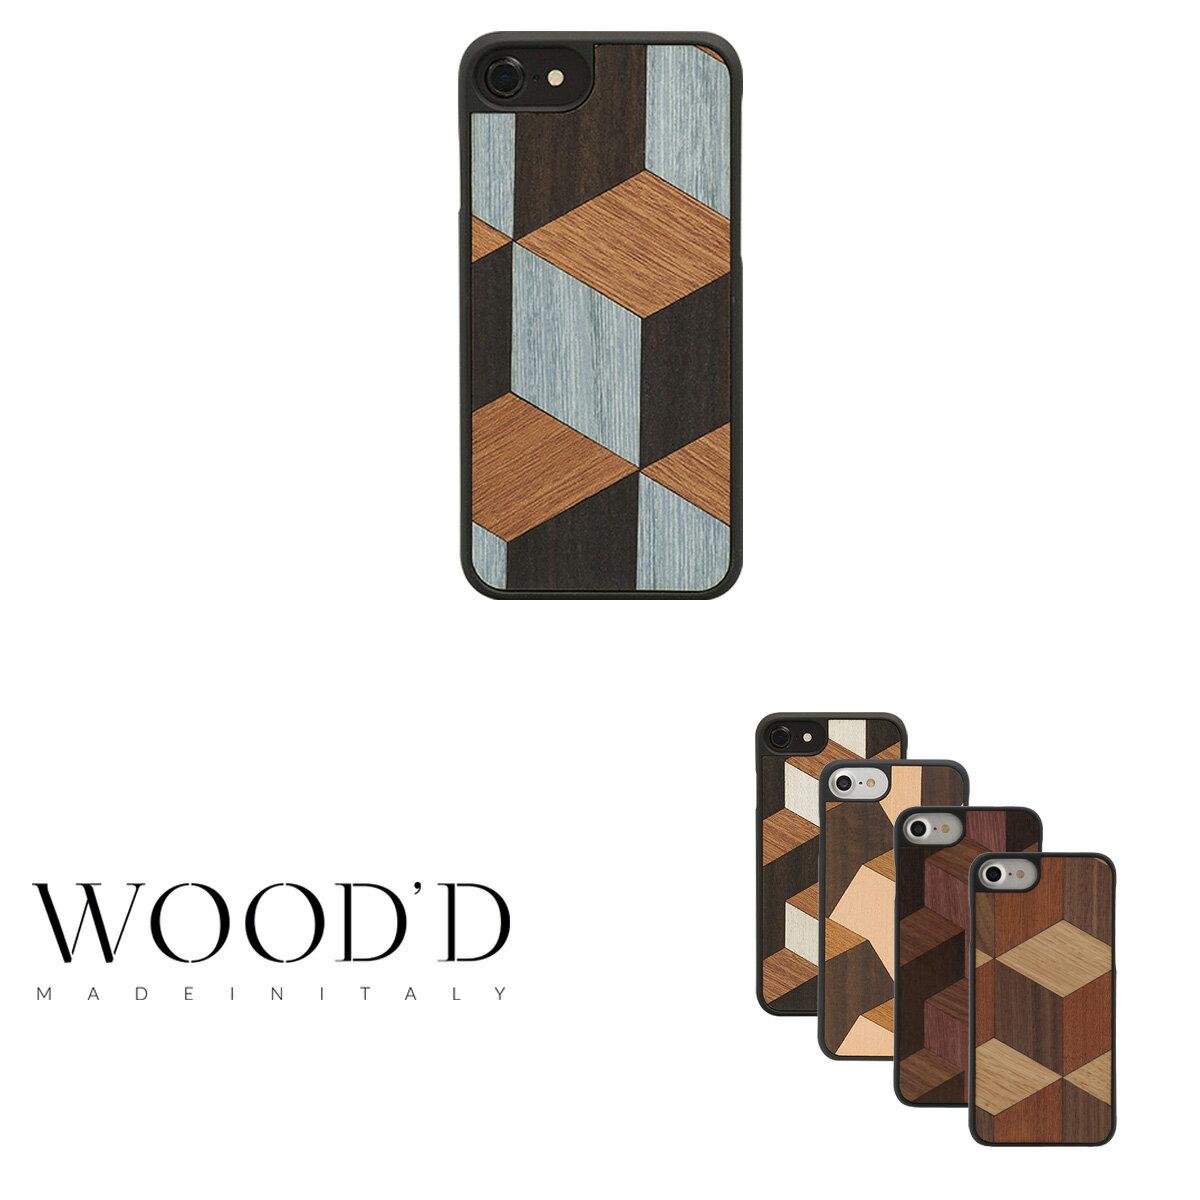 Wood'd iPhone8 iPhone7 iPhone6 ケース Real wood Snap-on covers GEOMETRIC レディース メンズ 木製 イタリア製 アイフォン スマホケース スマートフォン カバー ハンドメイド ウッド 【PO10】【bef】【即日発送】